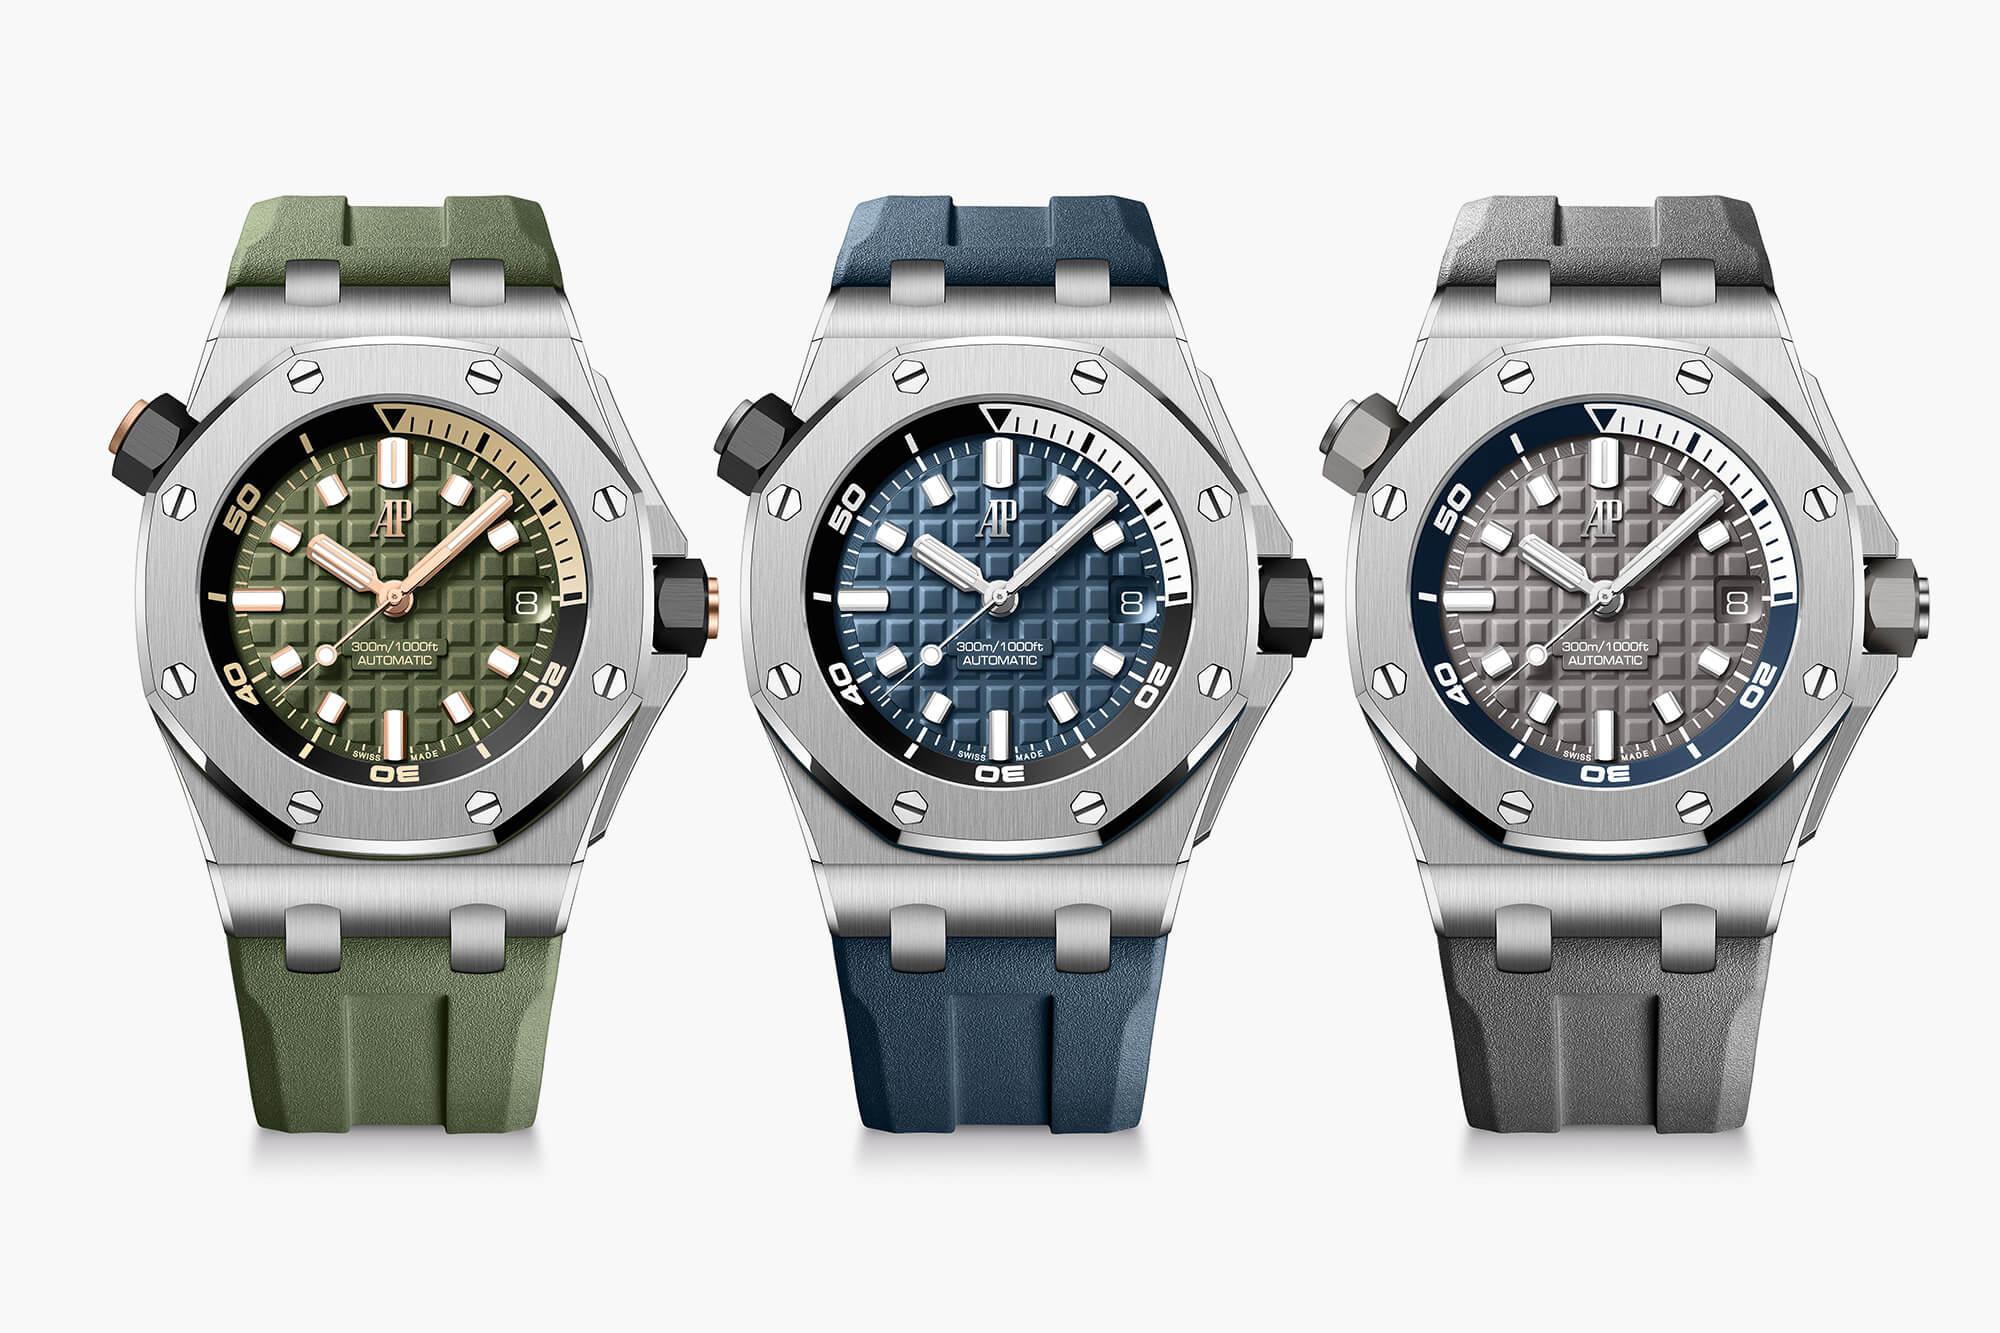 Introducing: Audemars Piguet Royal Oak Offshore Diver 2021 Collection -  Oracle Time